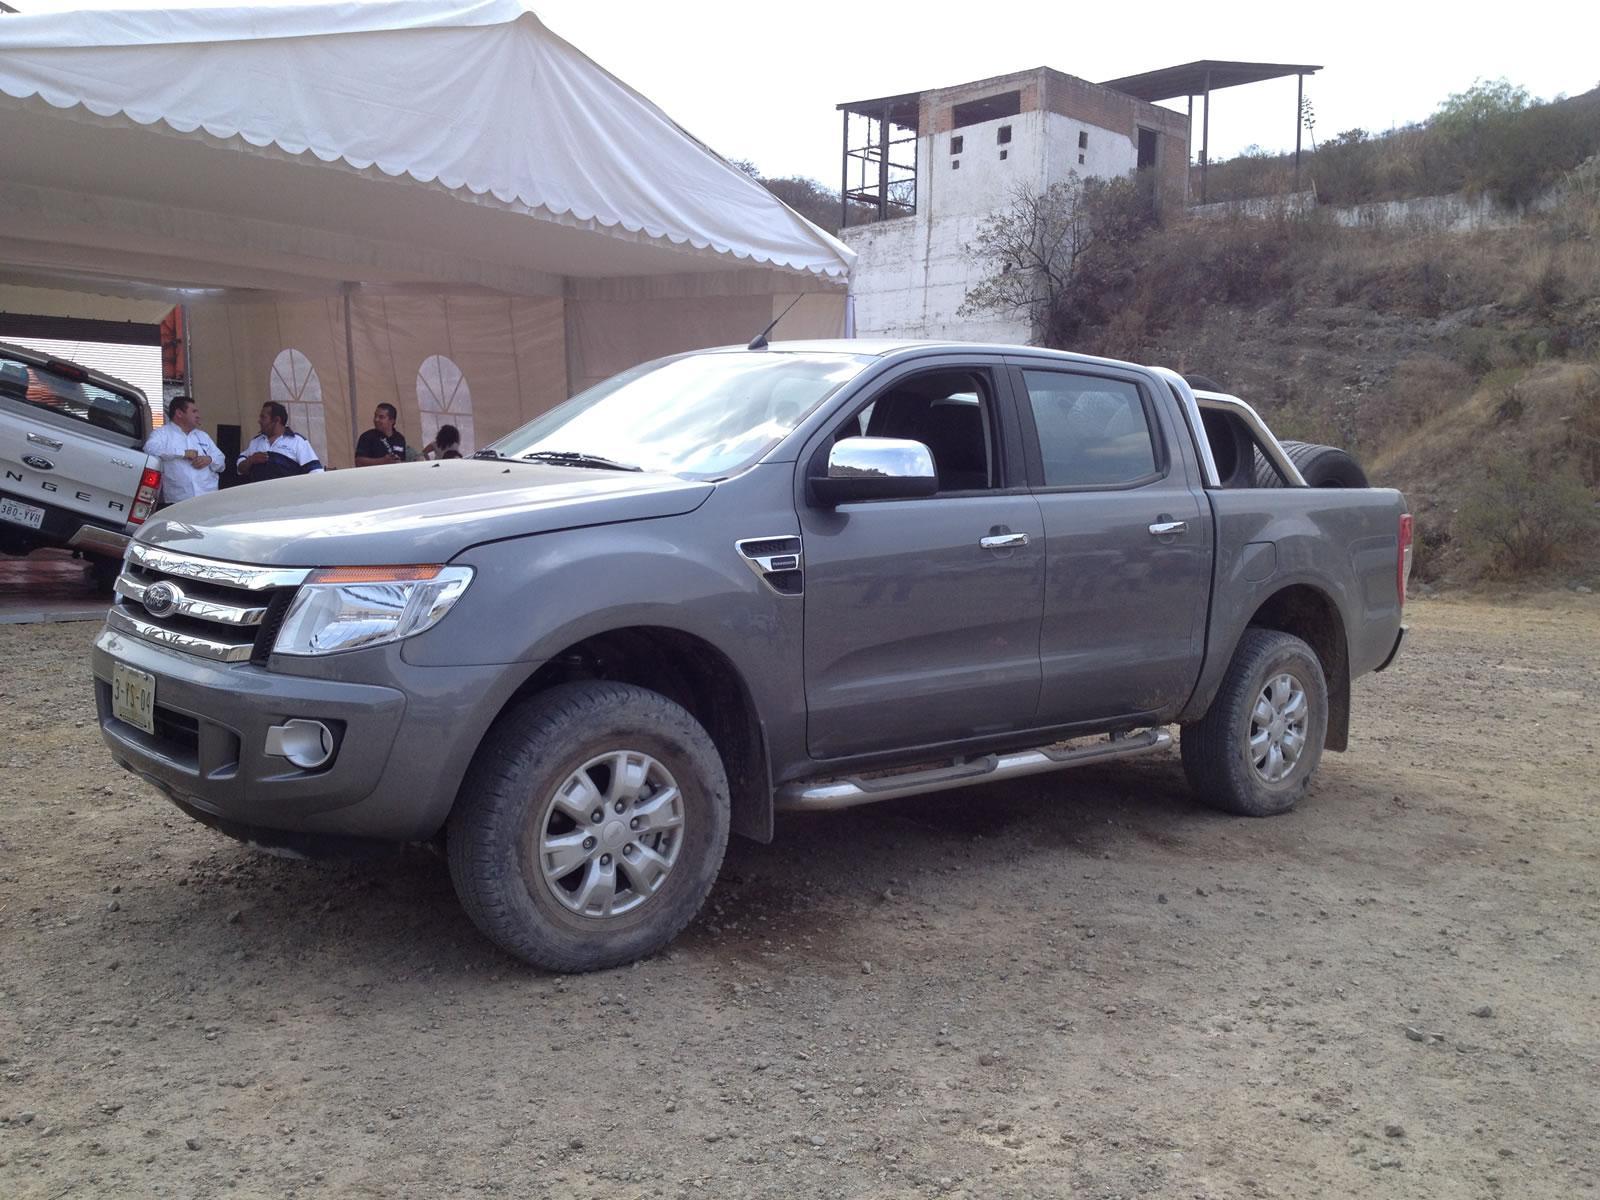 Ford Ranger 2013 llega a México desde $284,000 pesos - Autocosmos.com